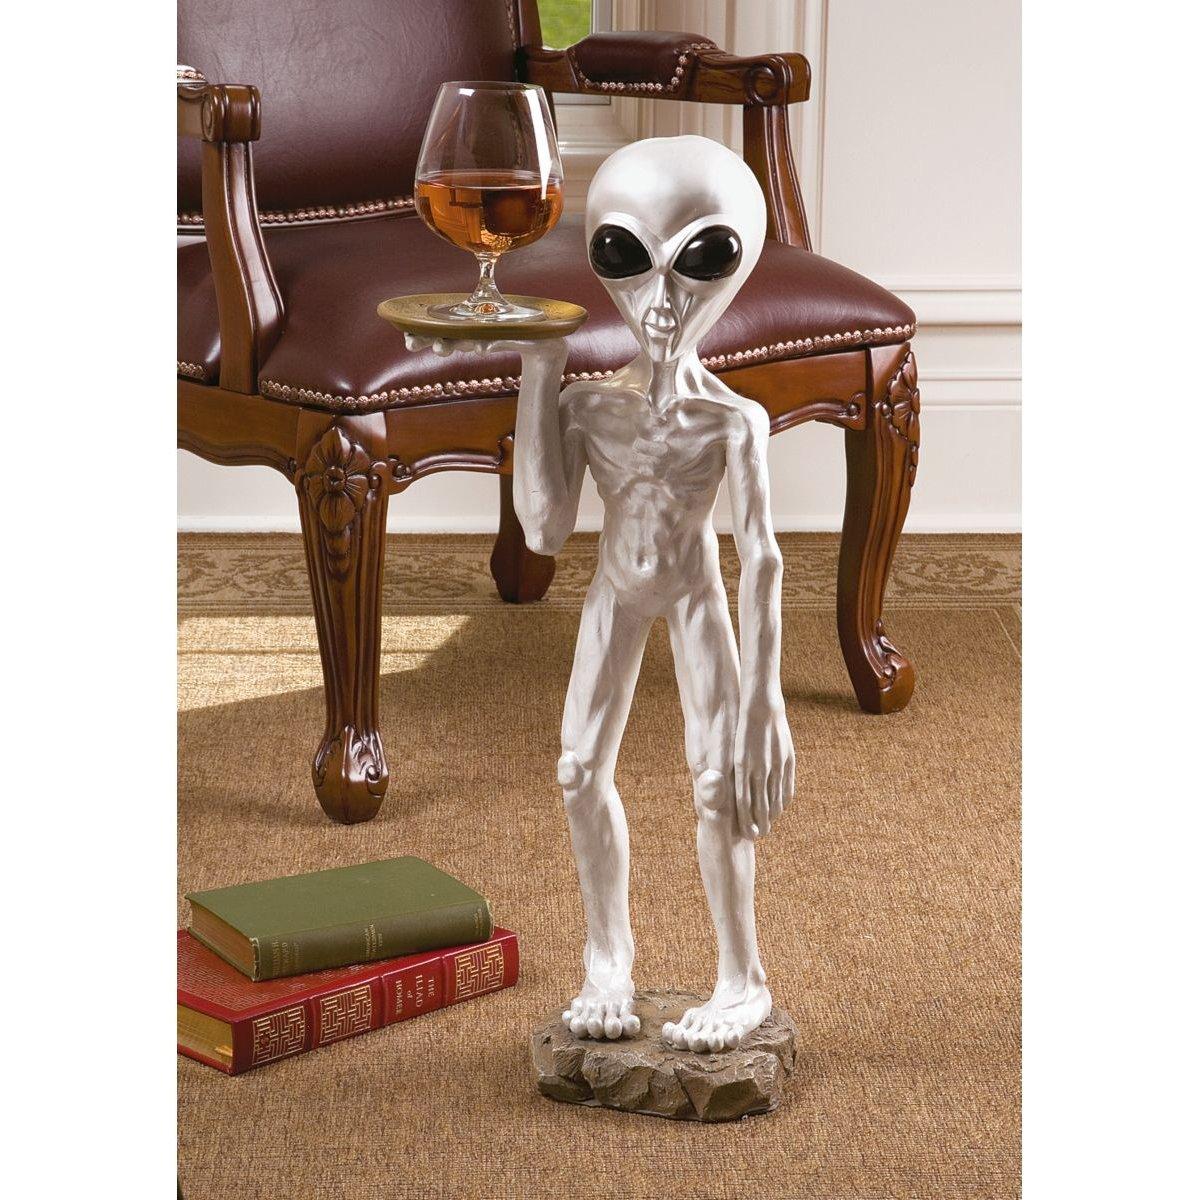 Amazon.com: Design Toscano Roswell, The Alien Butler Sculpture: Kitchen U0026  Dining